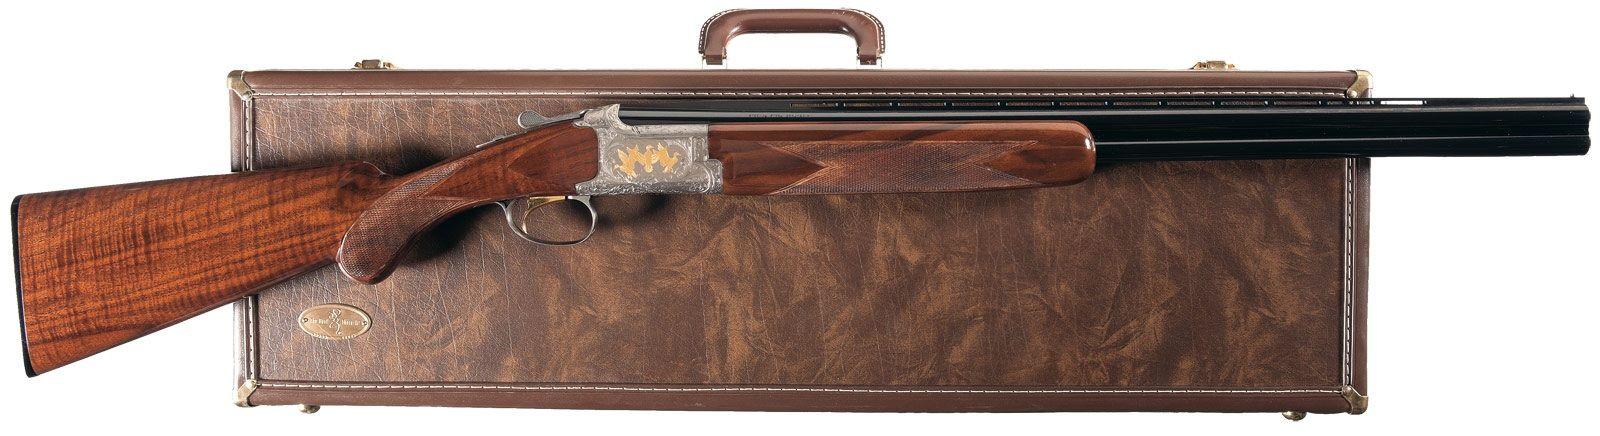 browning citori shotgun serial numbers